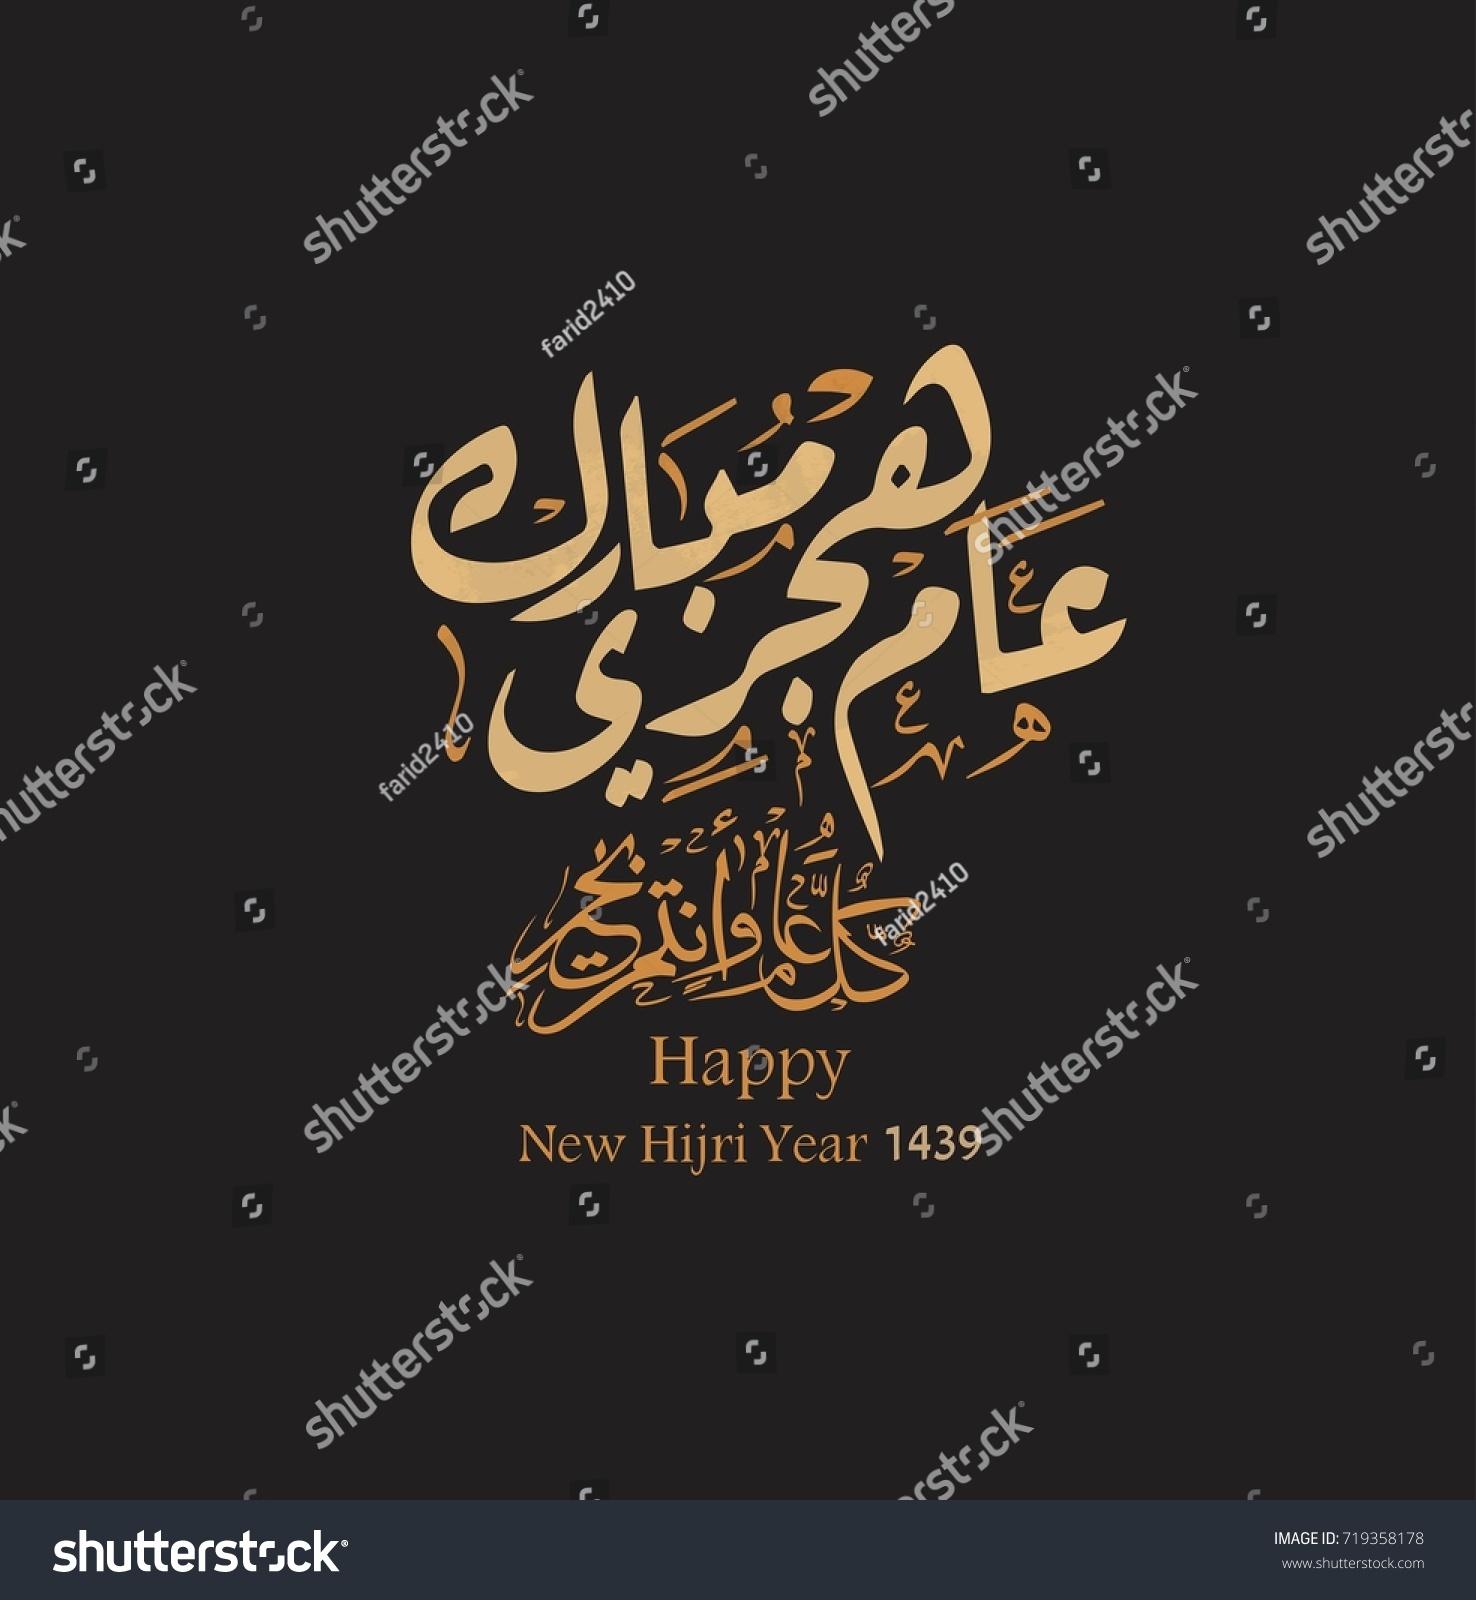 Hijri Year Logo Vector Arabic Calligraphy Stock Vector Royalty Free